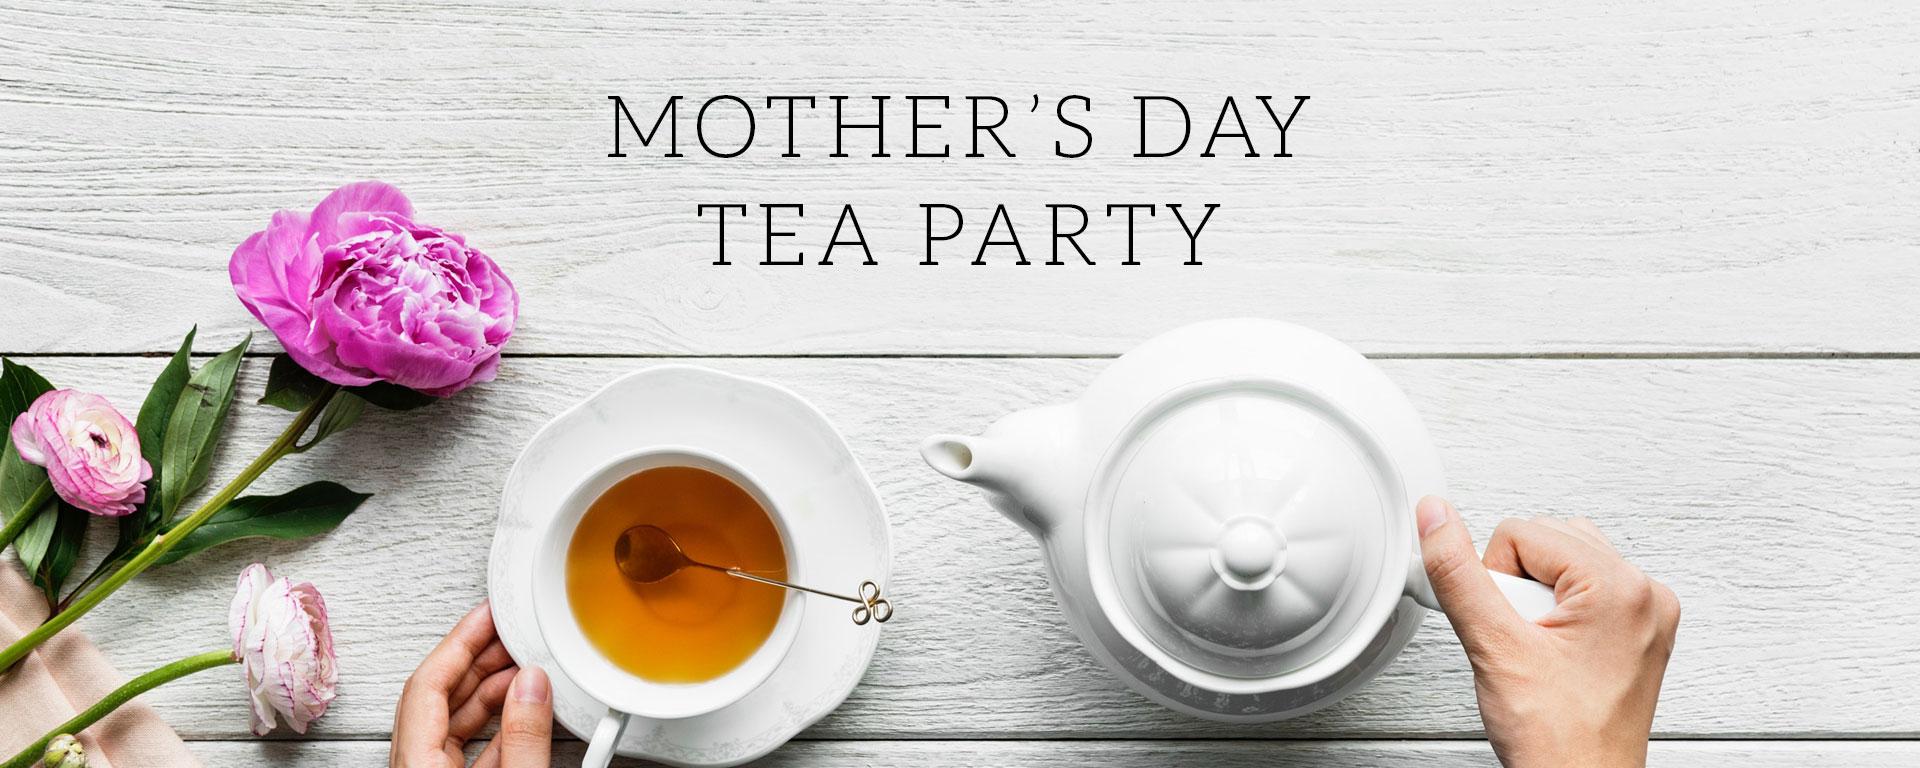 mothers-day-tea-party-slider.jpg